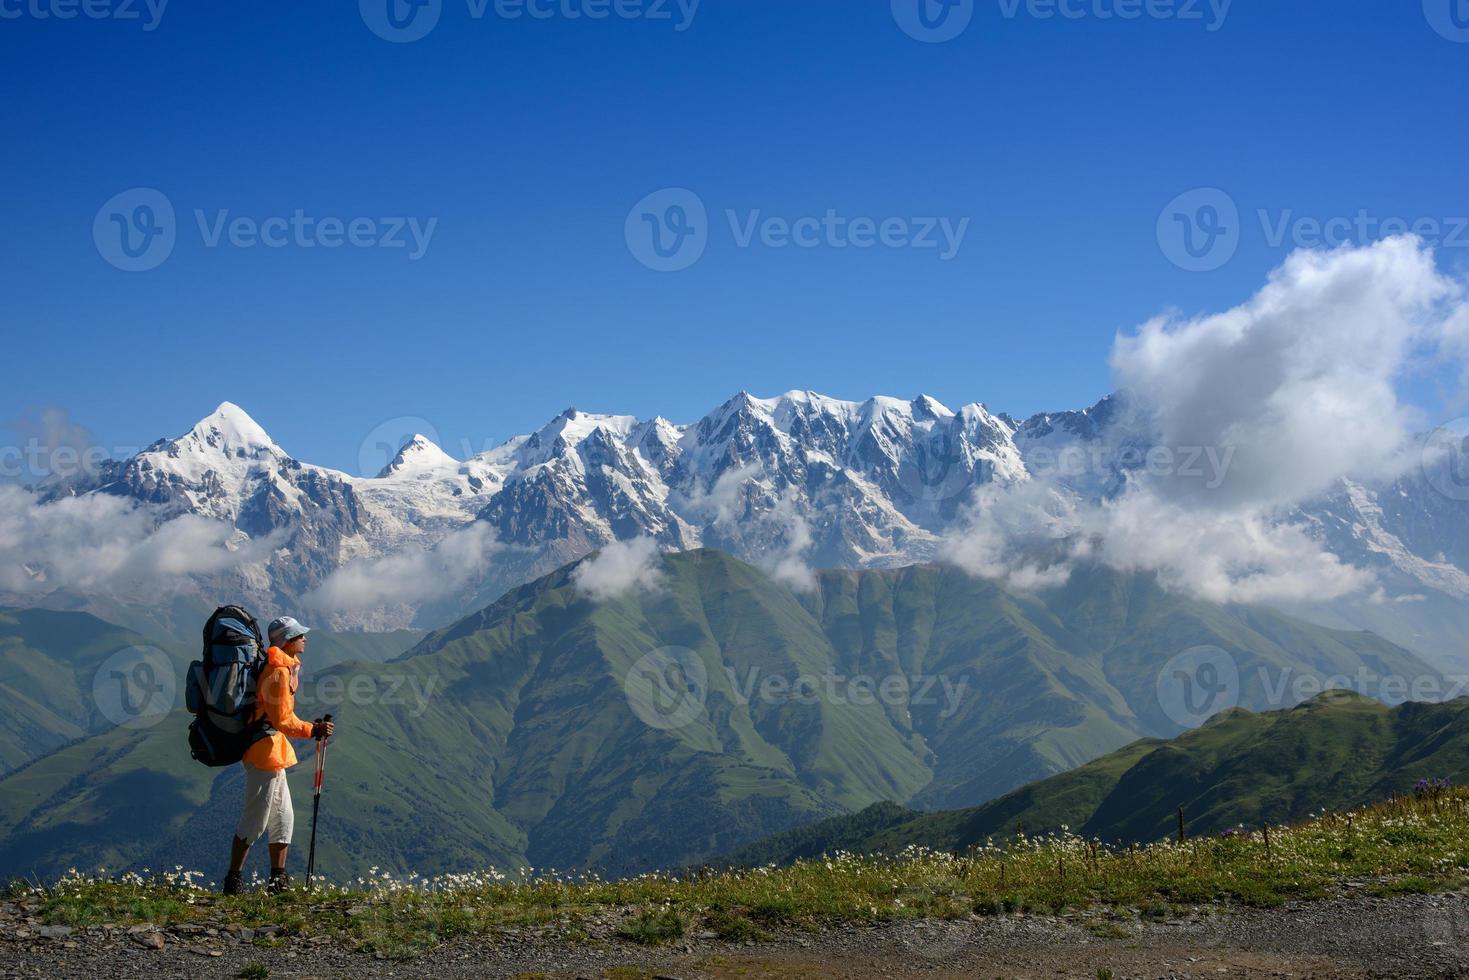 bergspromenad på sommaren foto